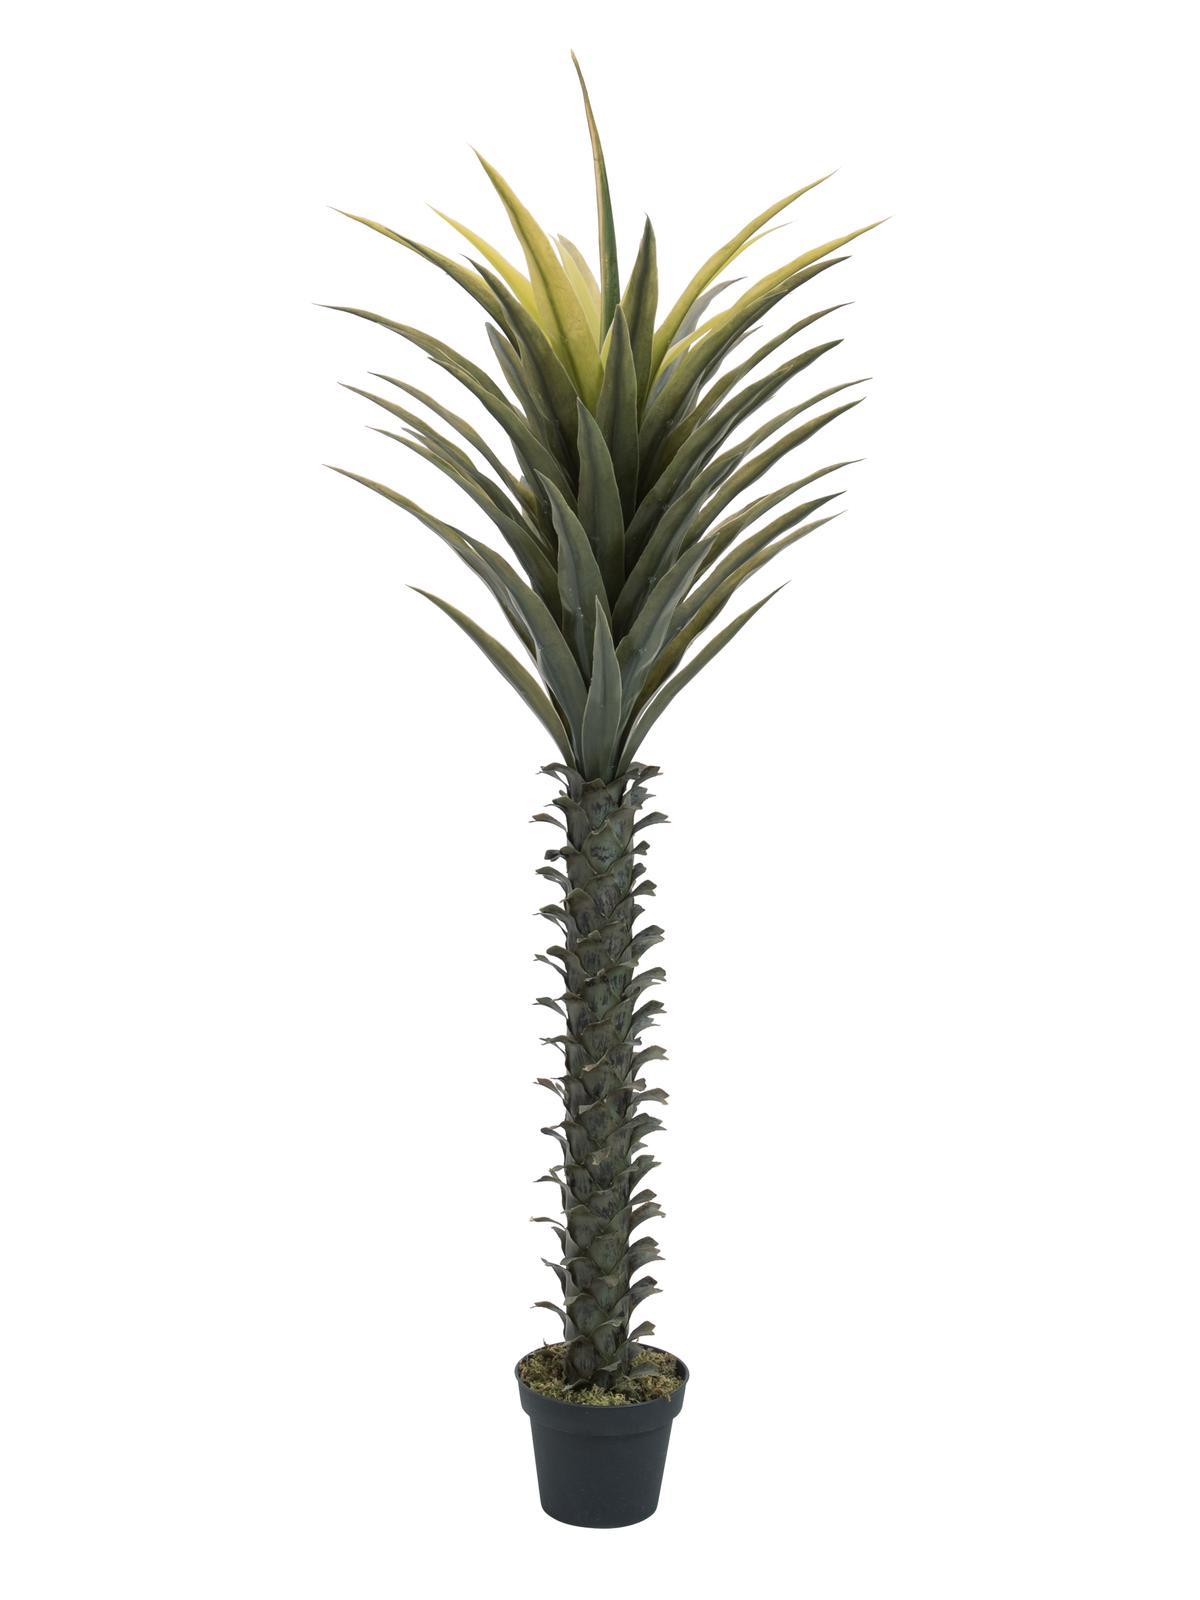 EUROPALMS pianta artificiale Yucca palma, 165cm